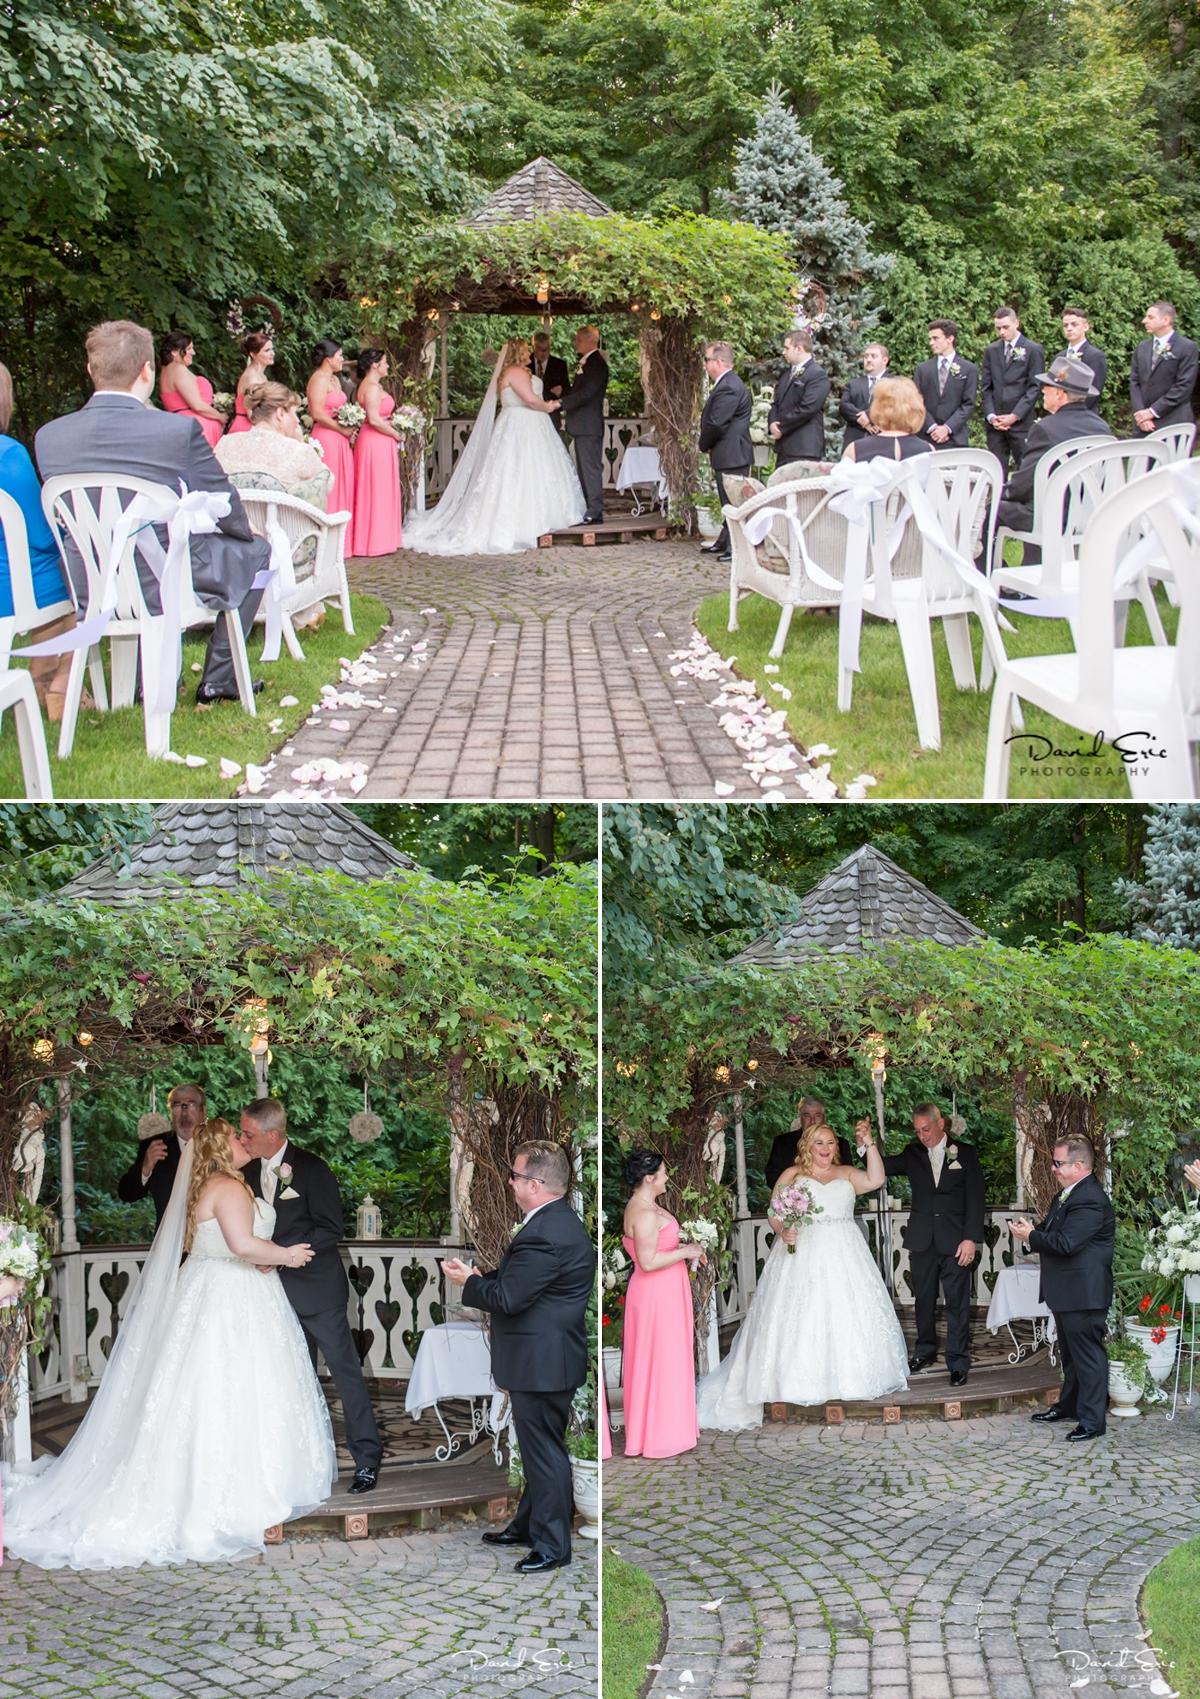 kronyak-wedding-david-eric-photography-woodcliff-lake-new-jersey-16